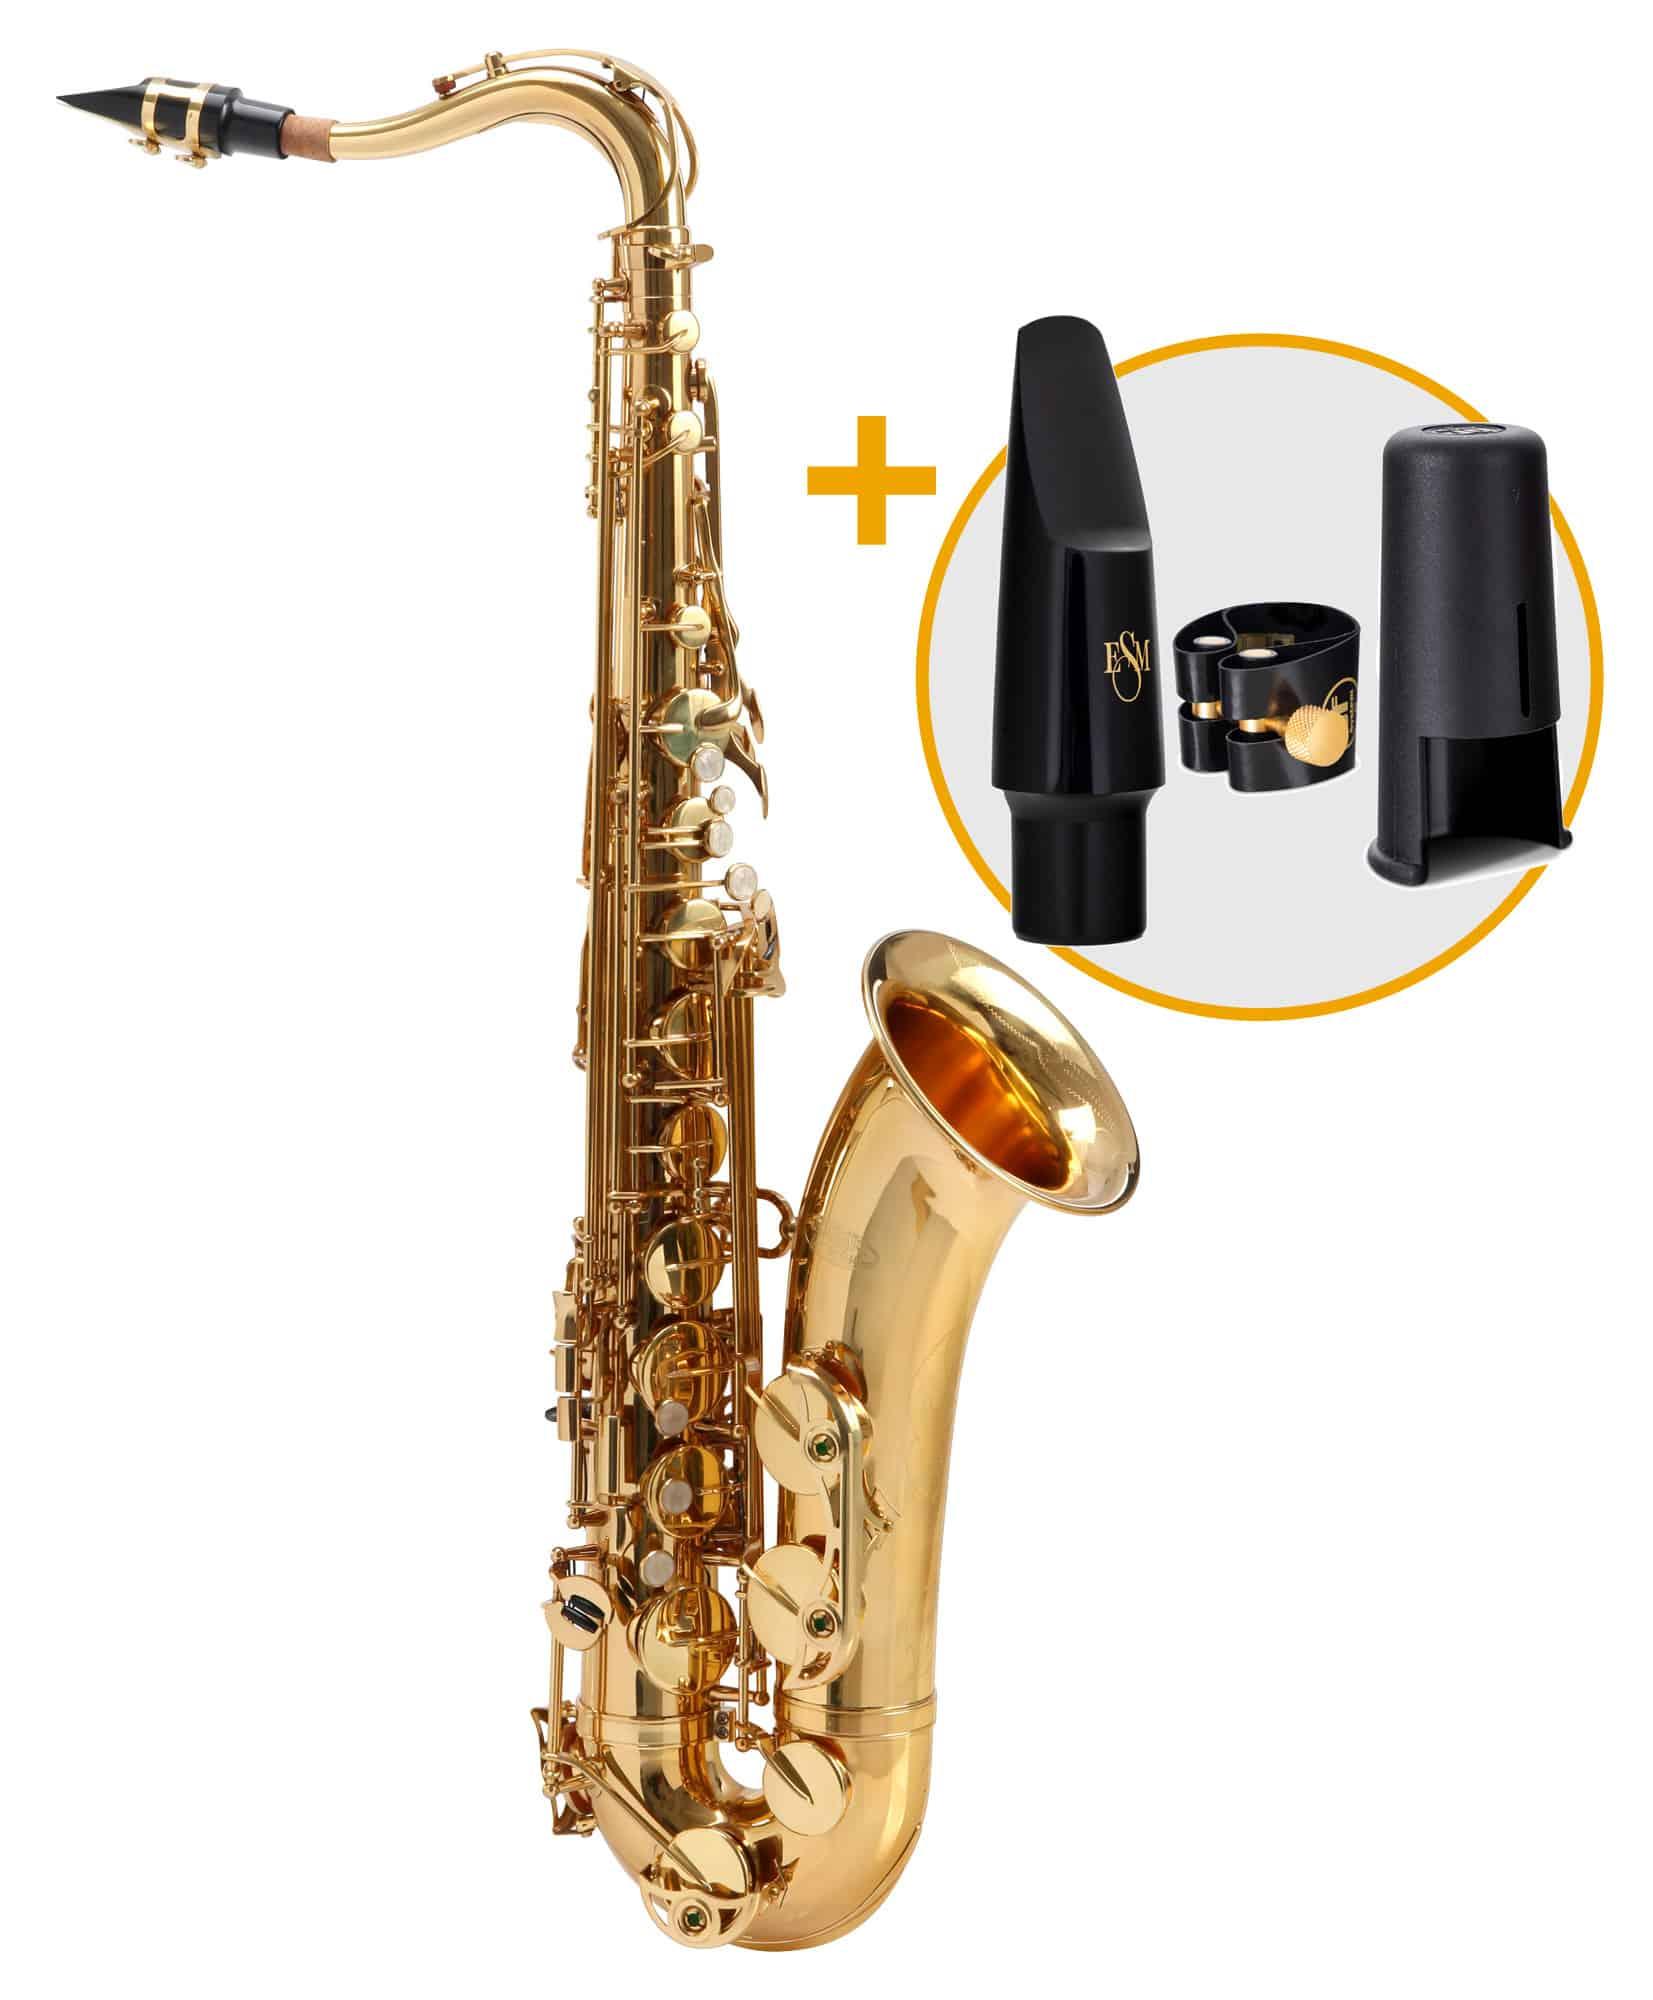 Saxophone - Classic Cantabile TS 450 Bb Tenorsaxophon ESM Set - Onlineshop Musikhaus Kirstein